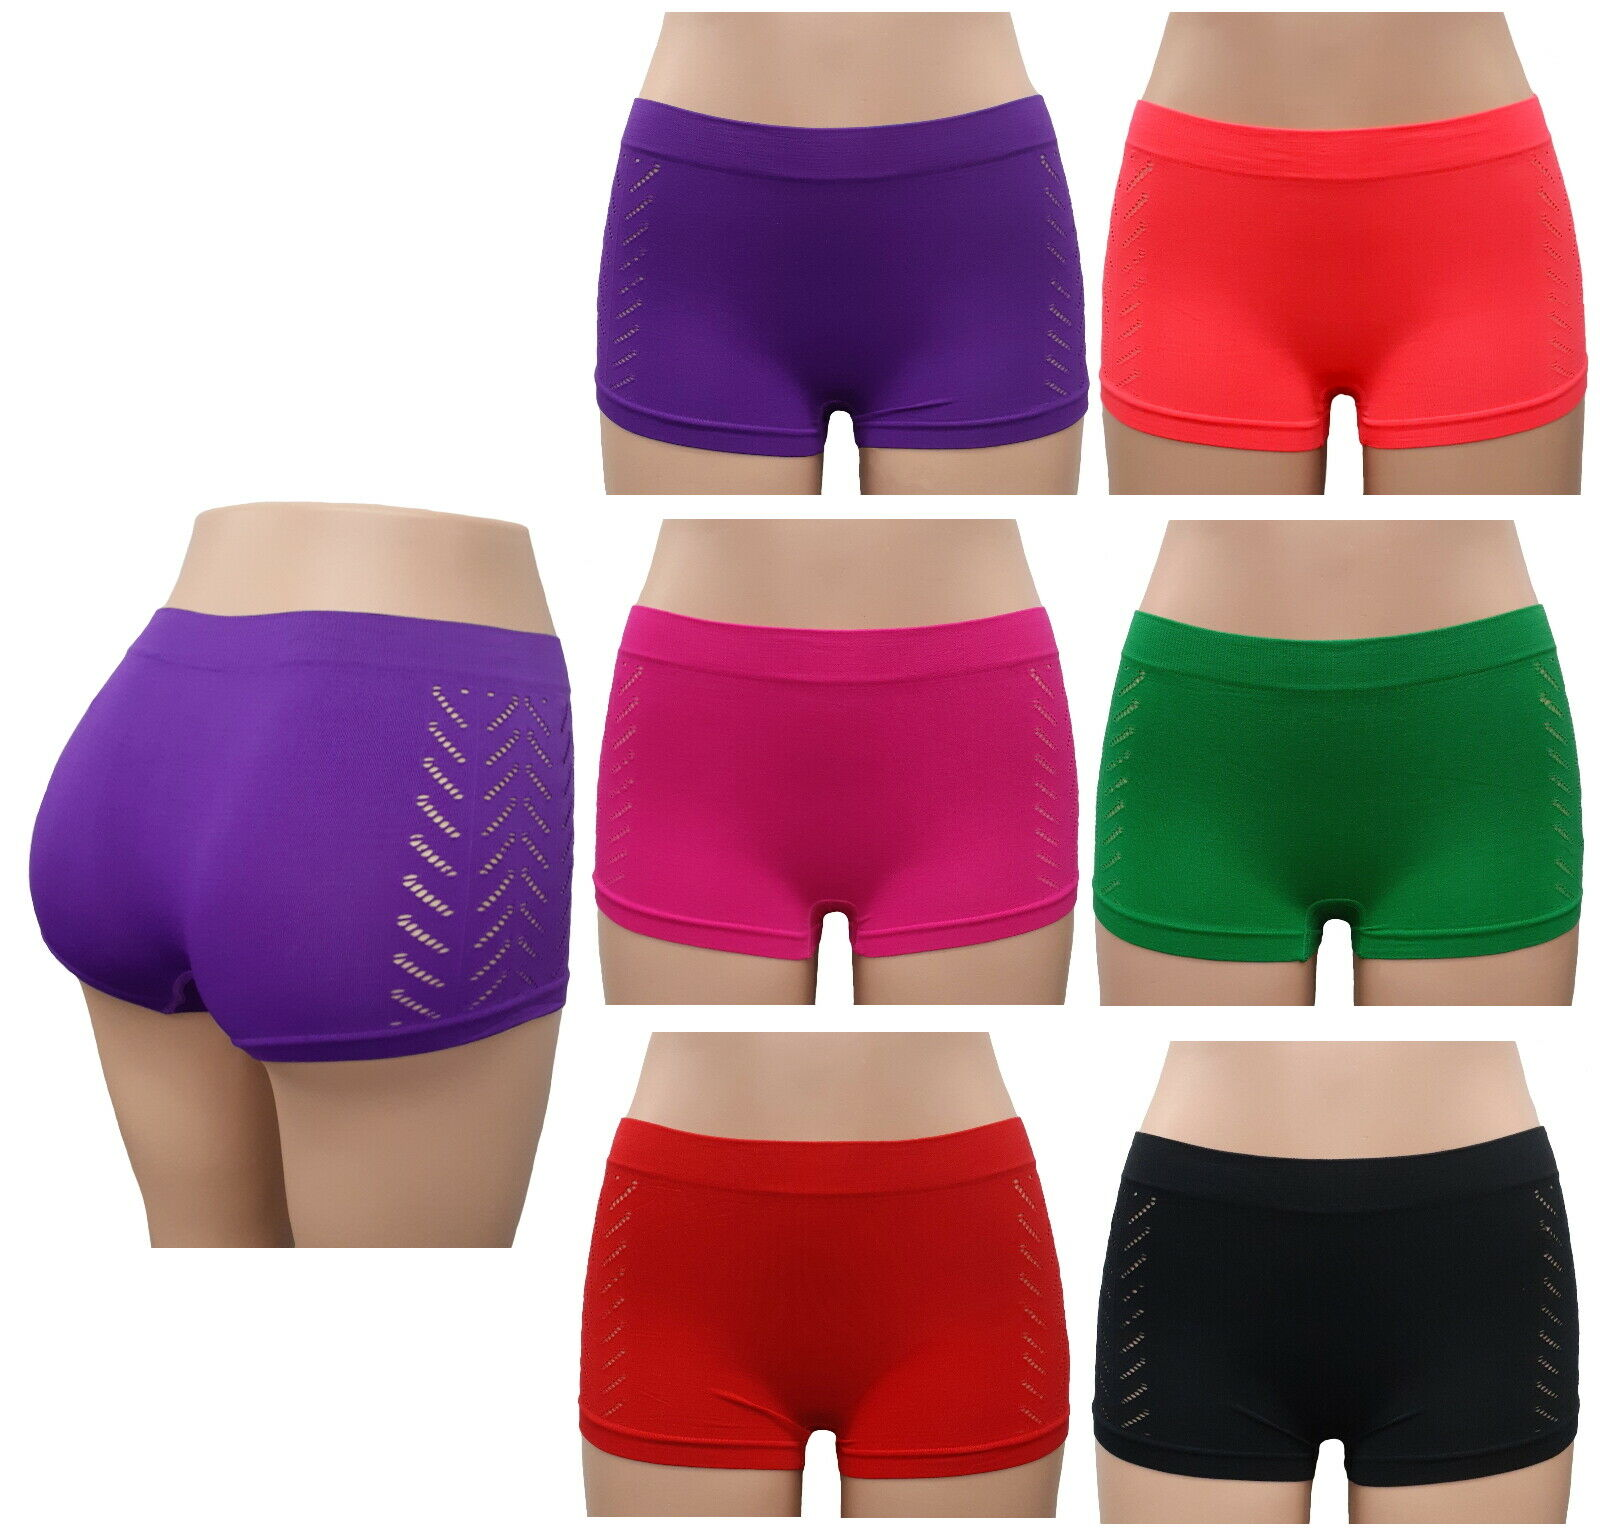 6 Seamless Boyshorts Womens Underwear Lot Booty Panties Boxer Brief Spandex New